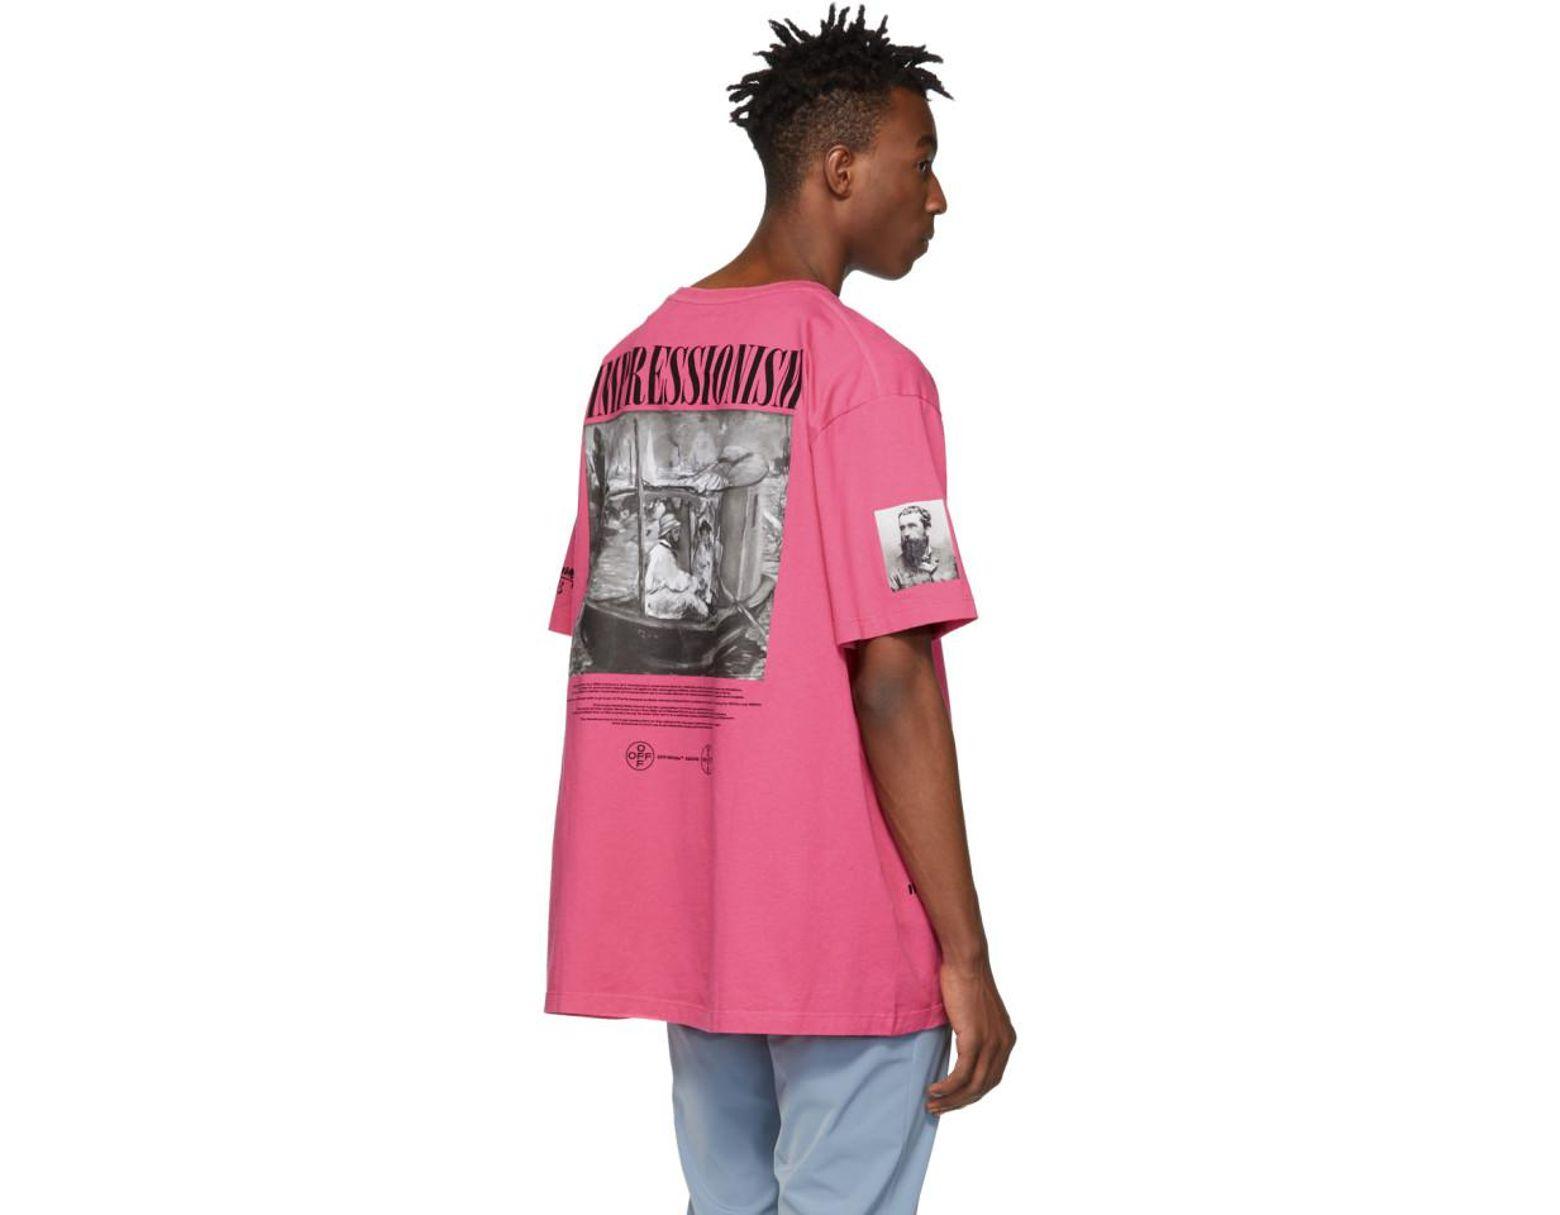 c6d6b89d25816f Off-White c/o Virgil Abloh Pink Impressionism Boat T-shirt in Pink for Men  - Save 35% - Lyst